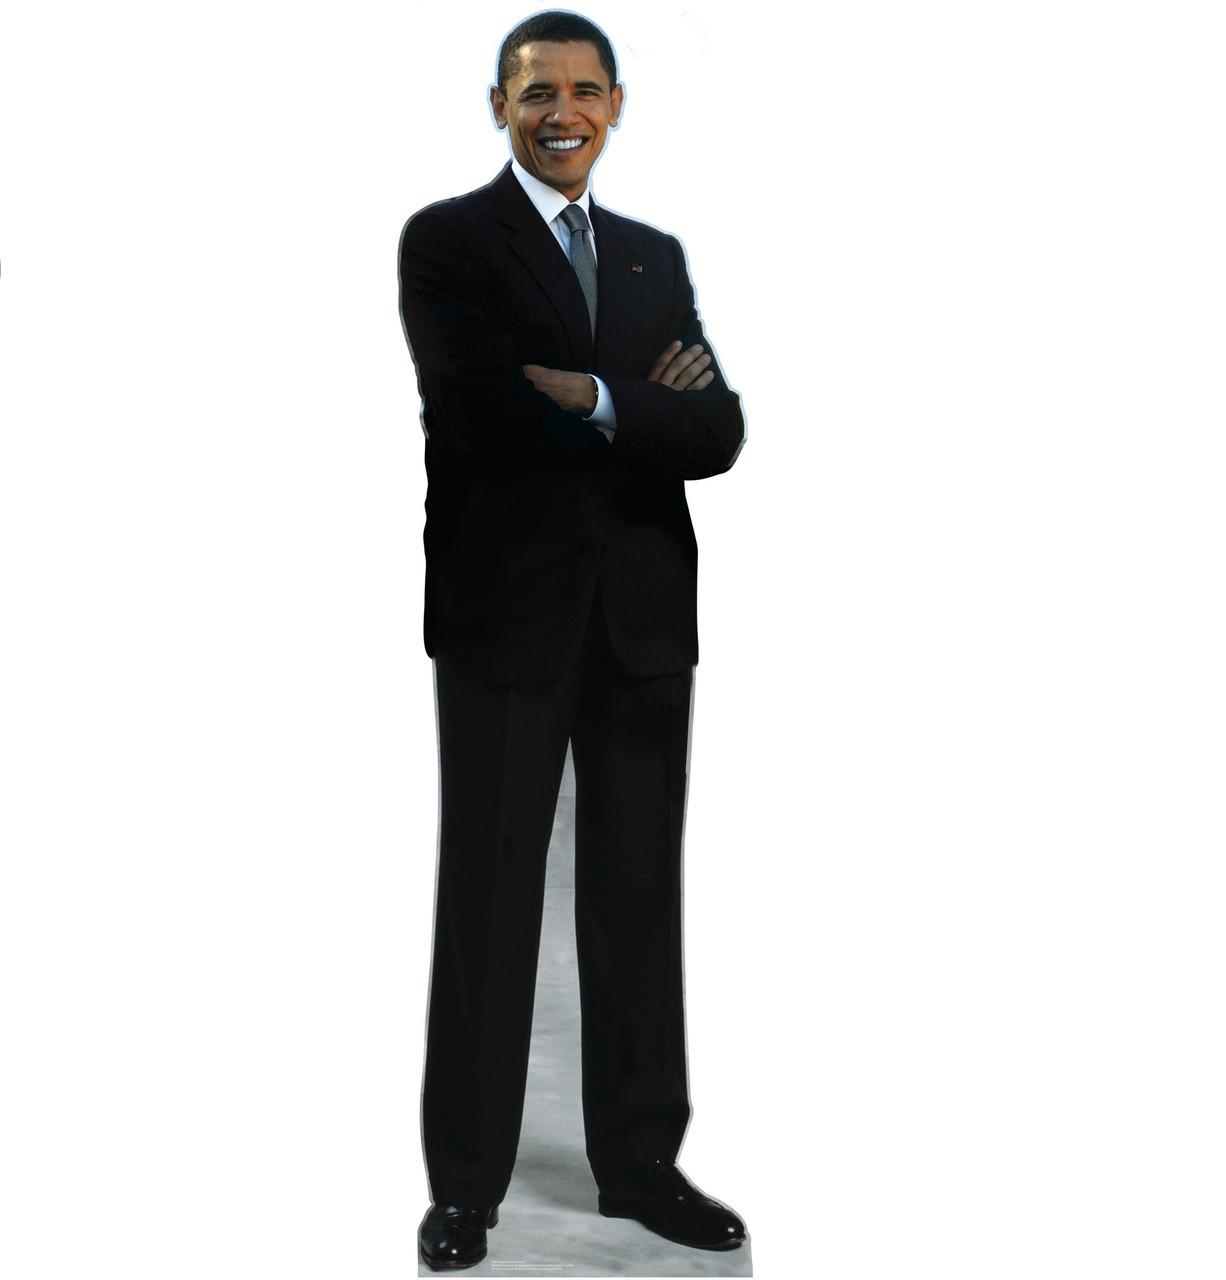 President Obama Cardboard Cutout - 739